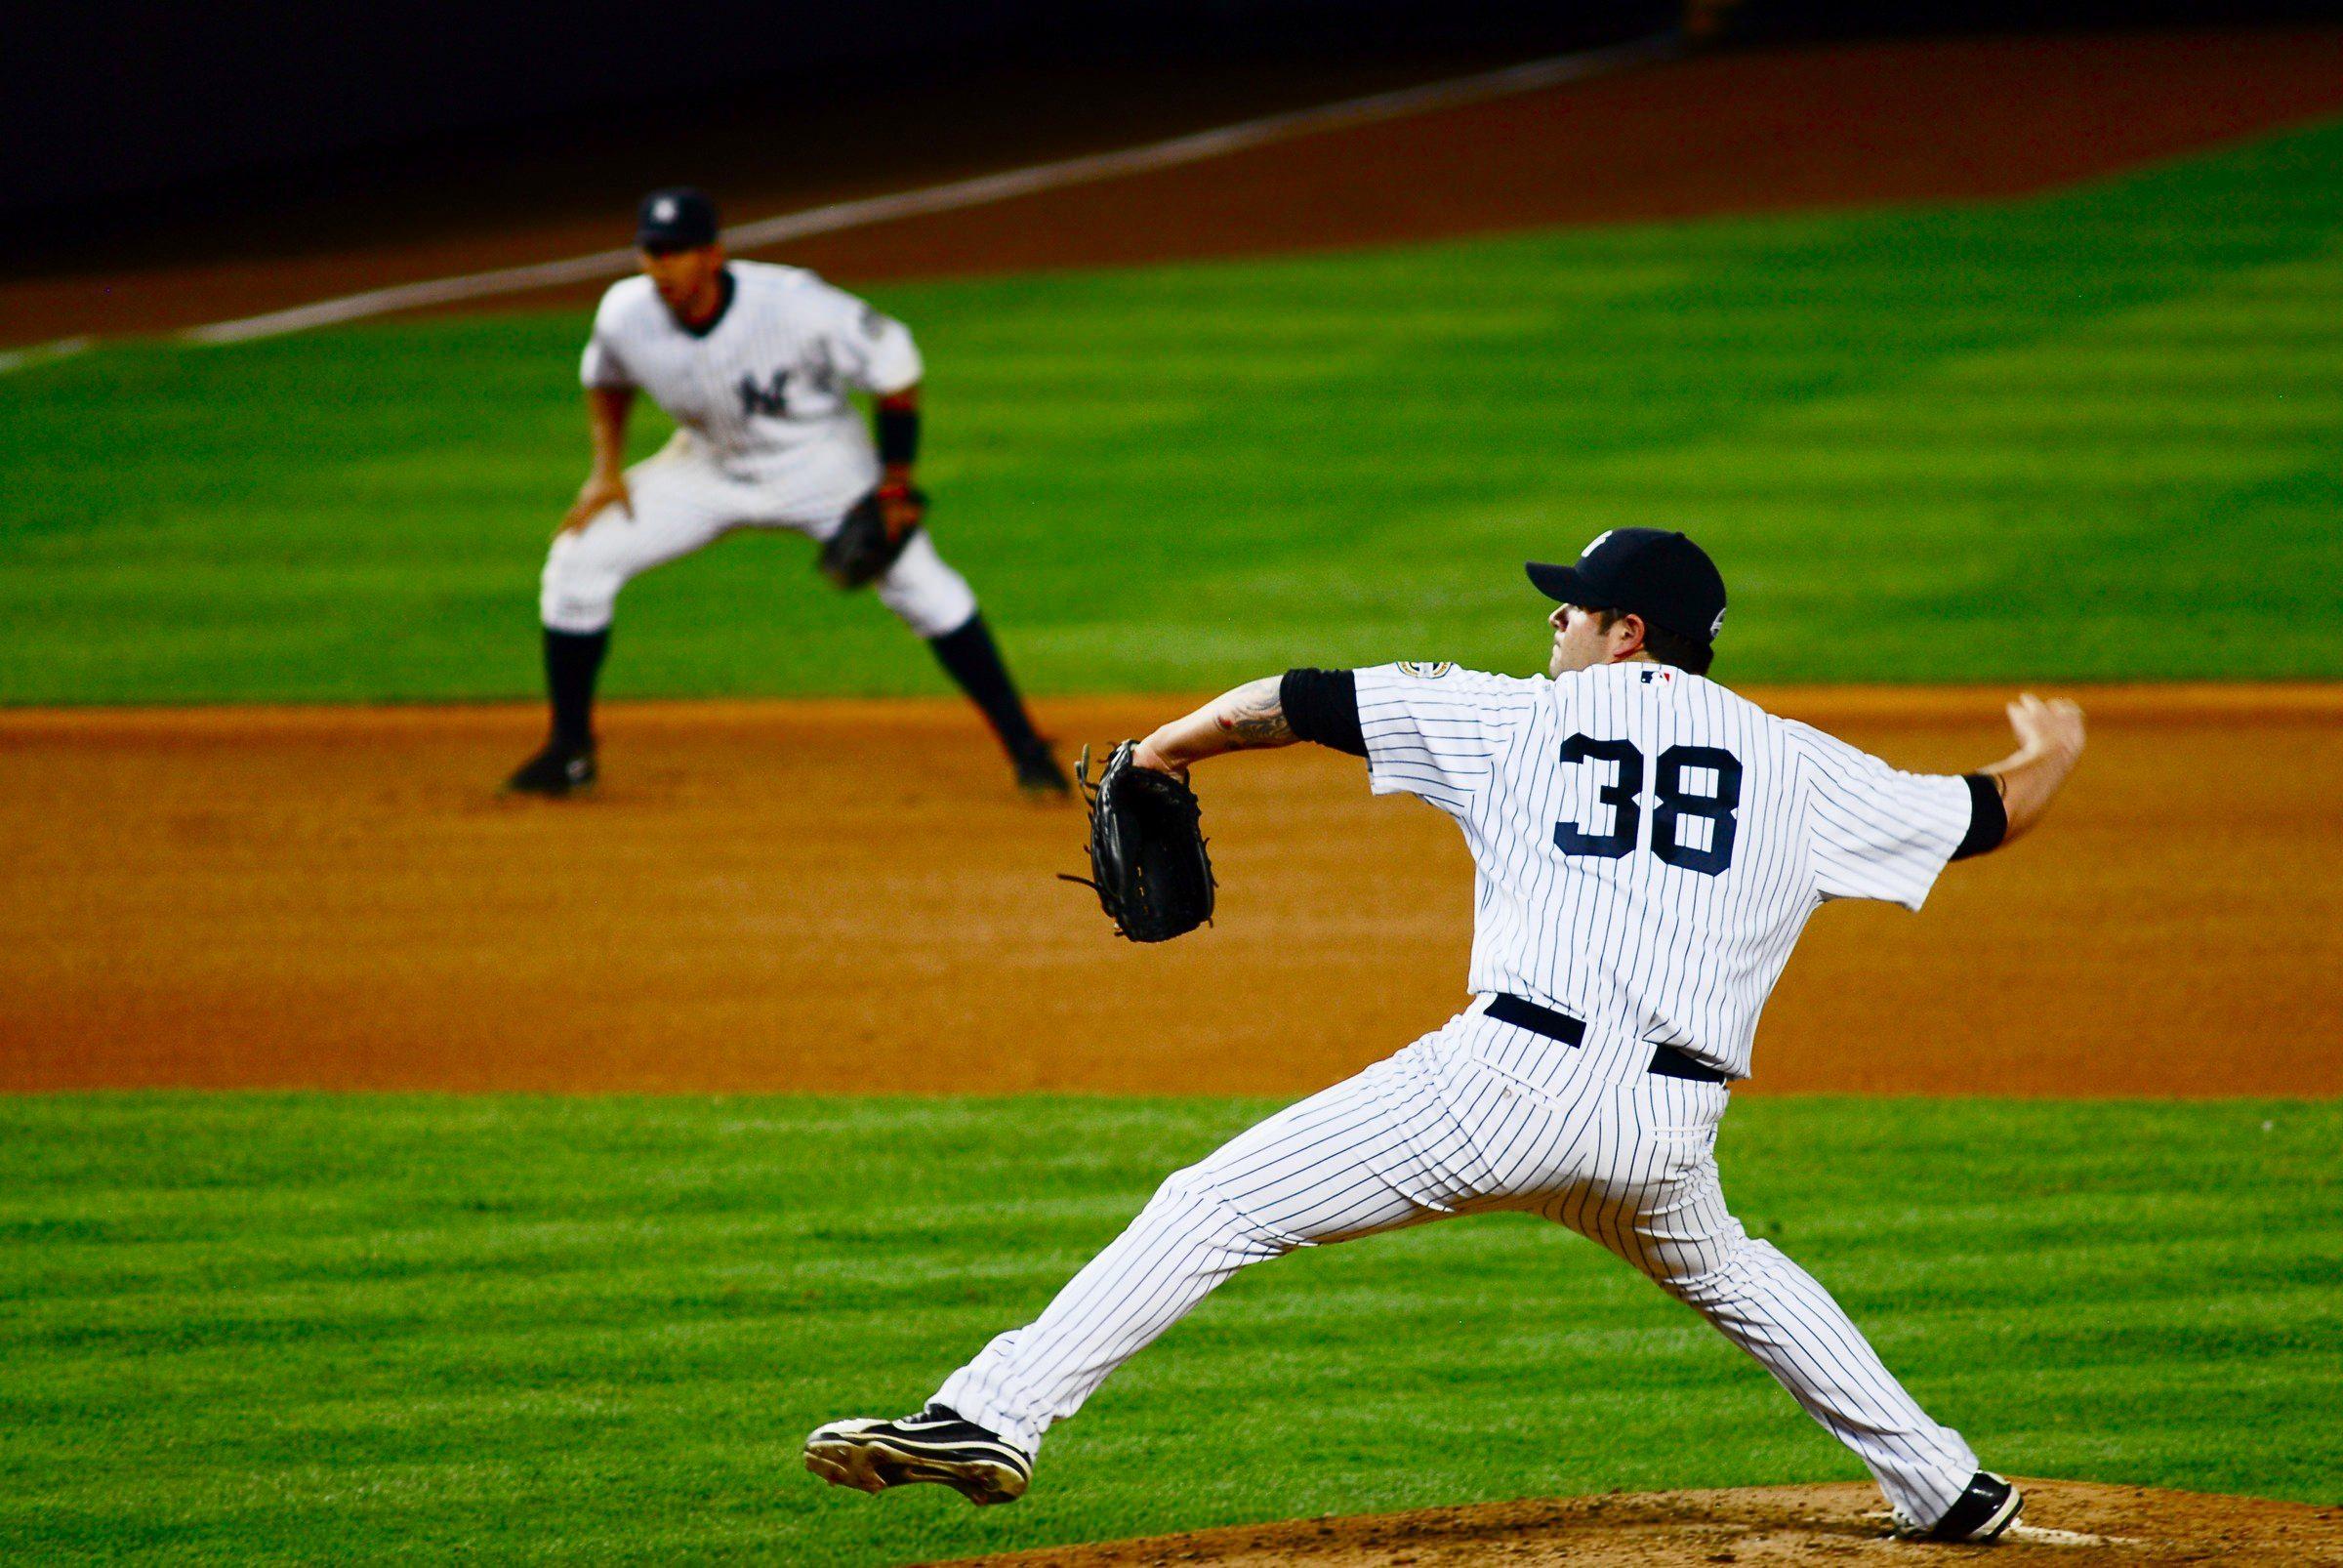 baseball1 image